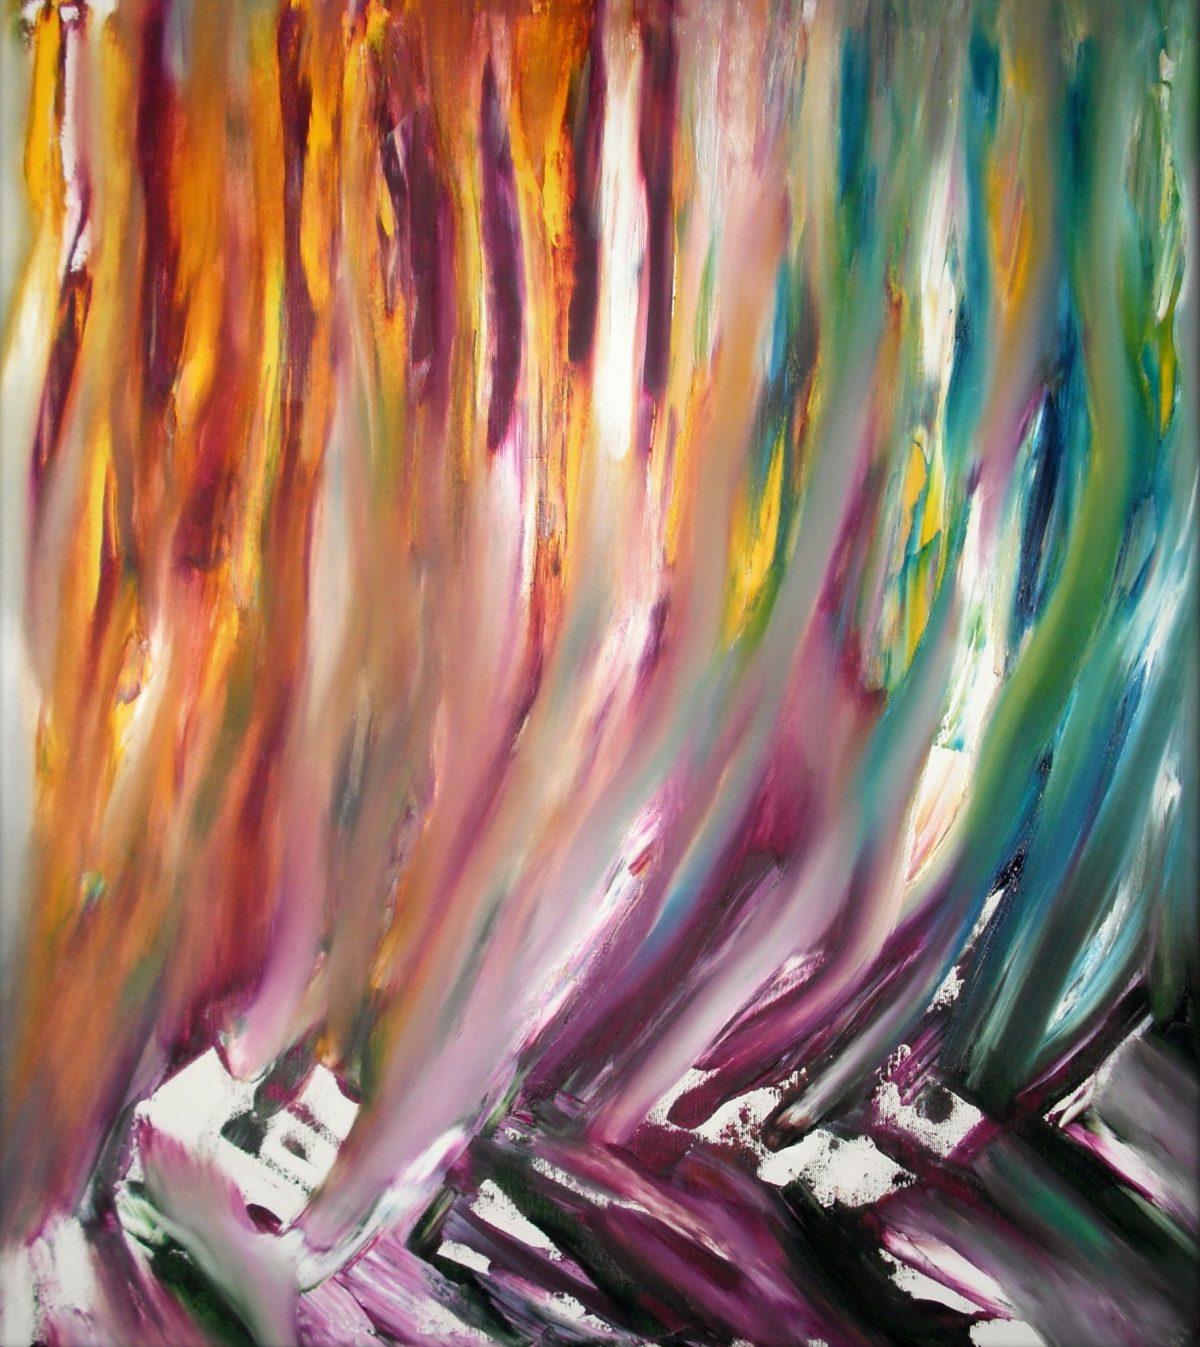 Fiumi di porpora, arte contemporanea by Davide De Palma